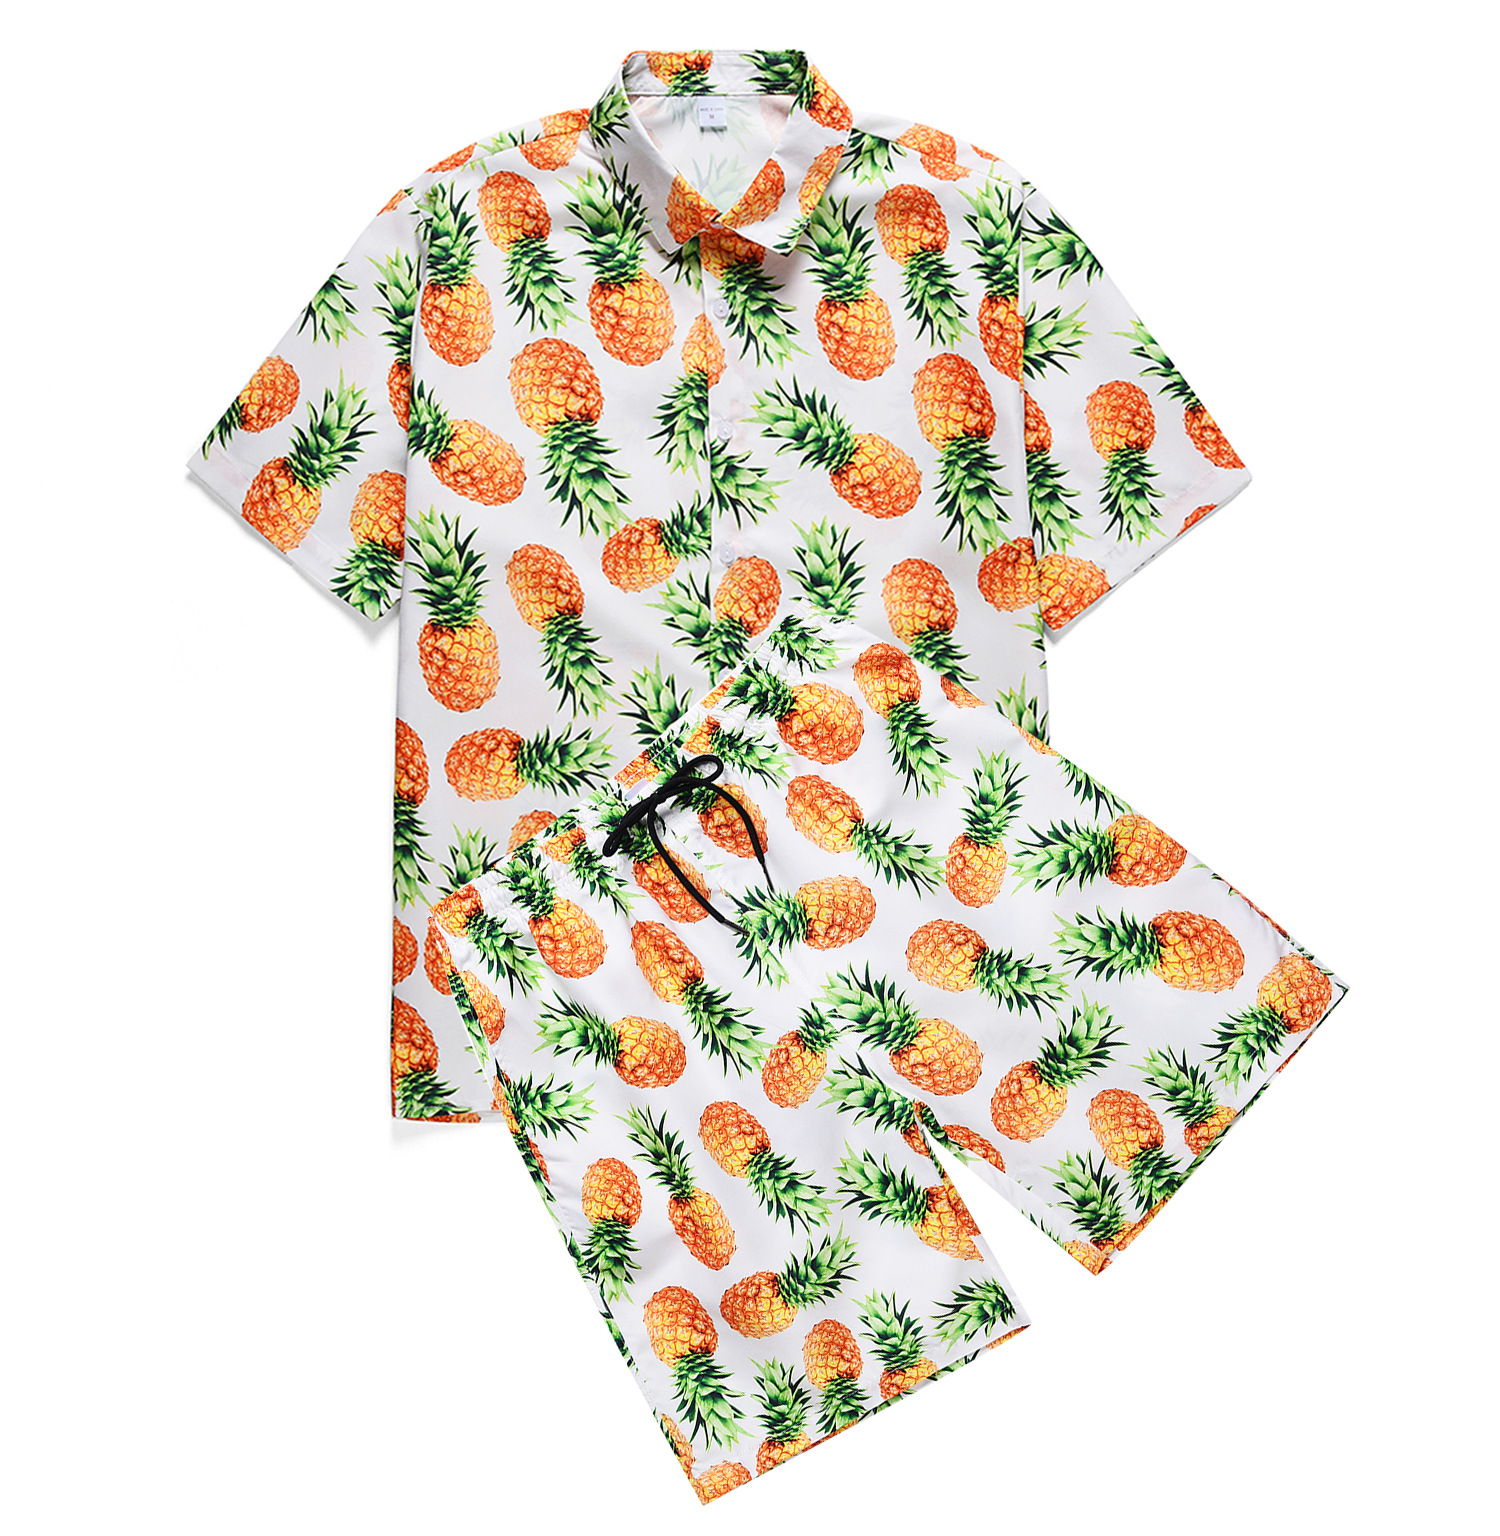 2020 New Men's Fruit Pineapple Print Hawaiian Style Shirt   Elastic Shorts Vacation Two Piece Hawaiian Beach Summer Sets